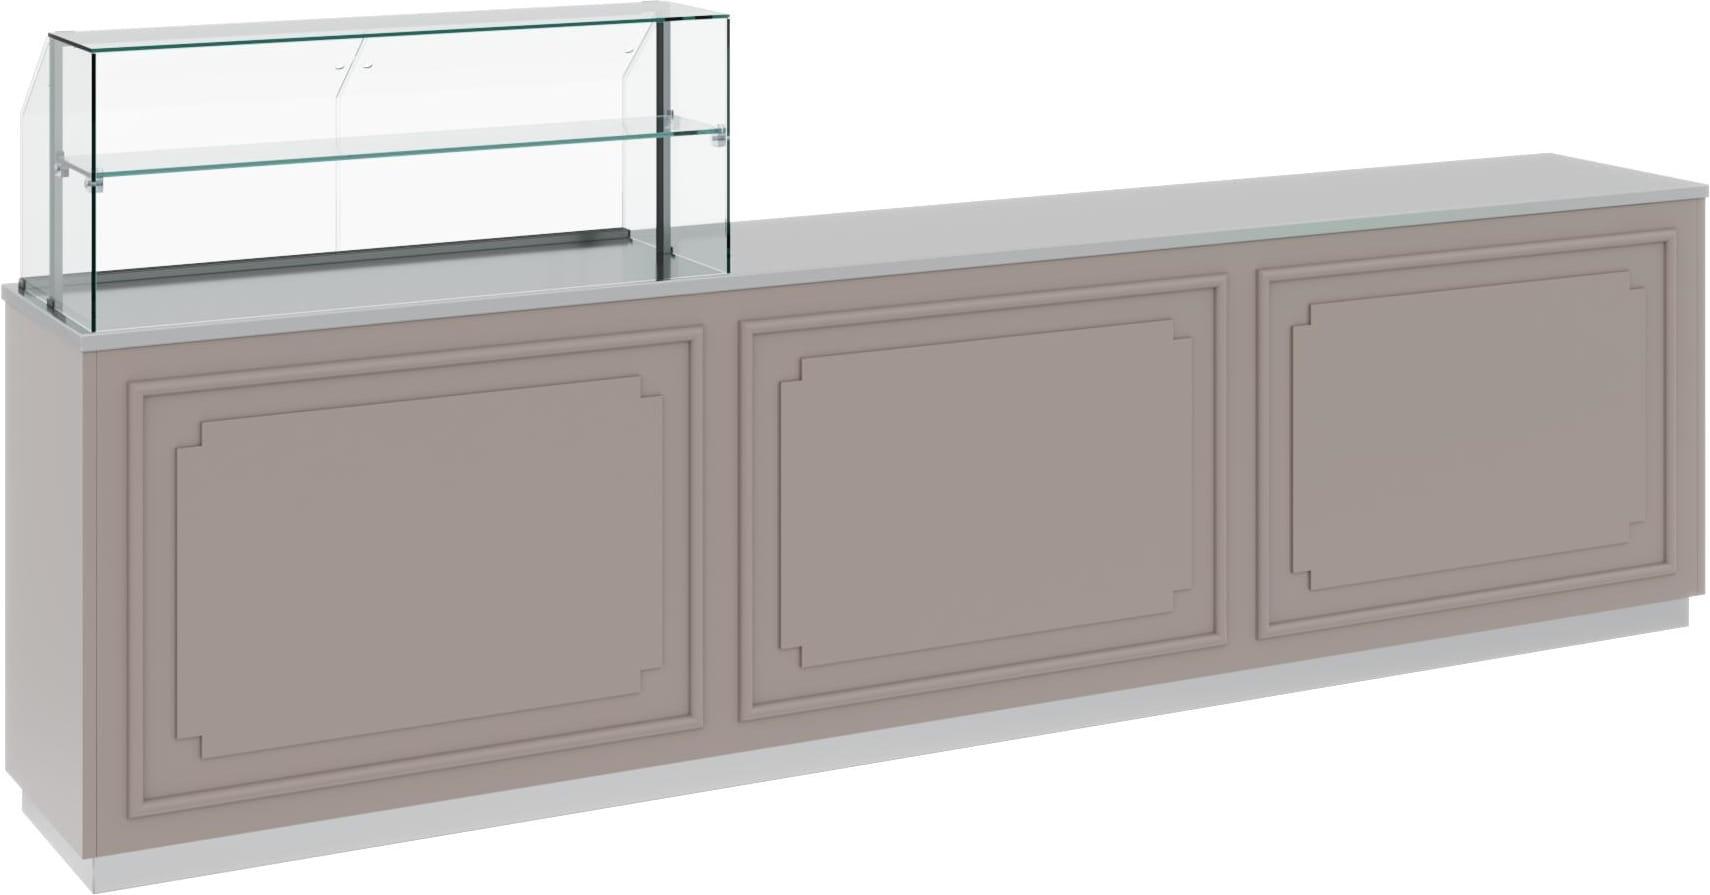 Нейтральная витрина CARBOMA OMI AC40N 1.75-11 - 1